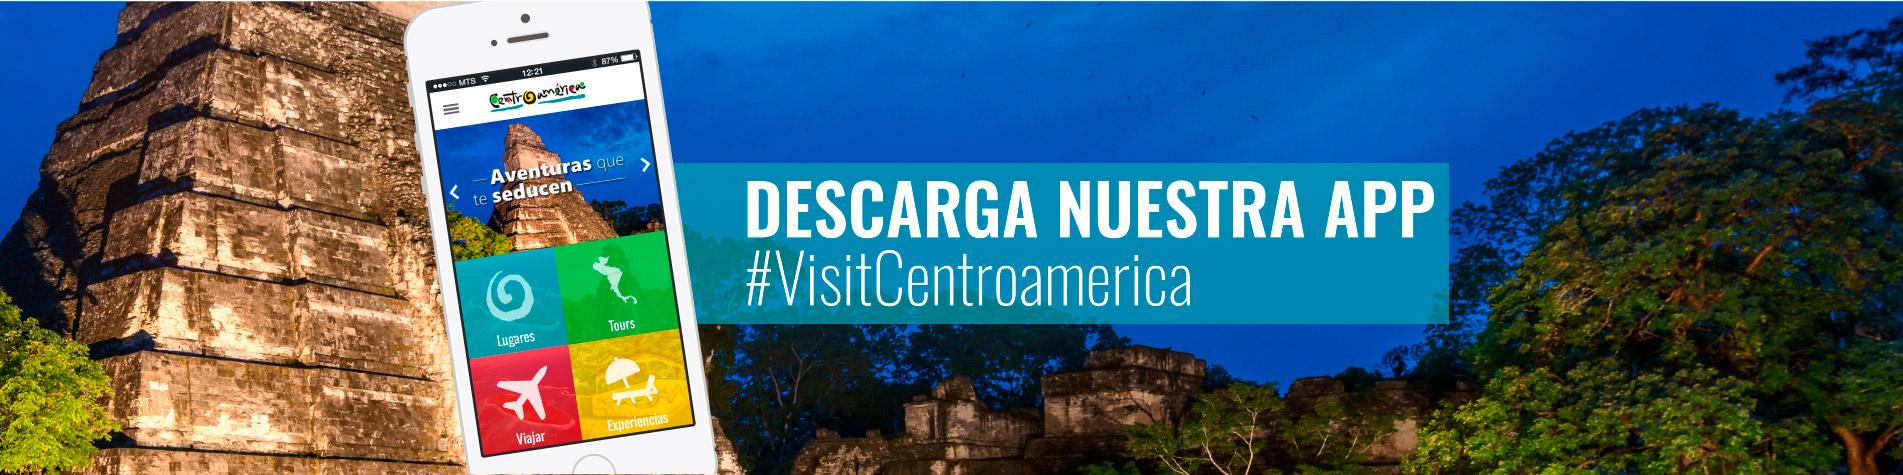 Visit Centroamérica APP